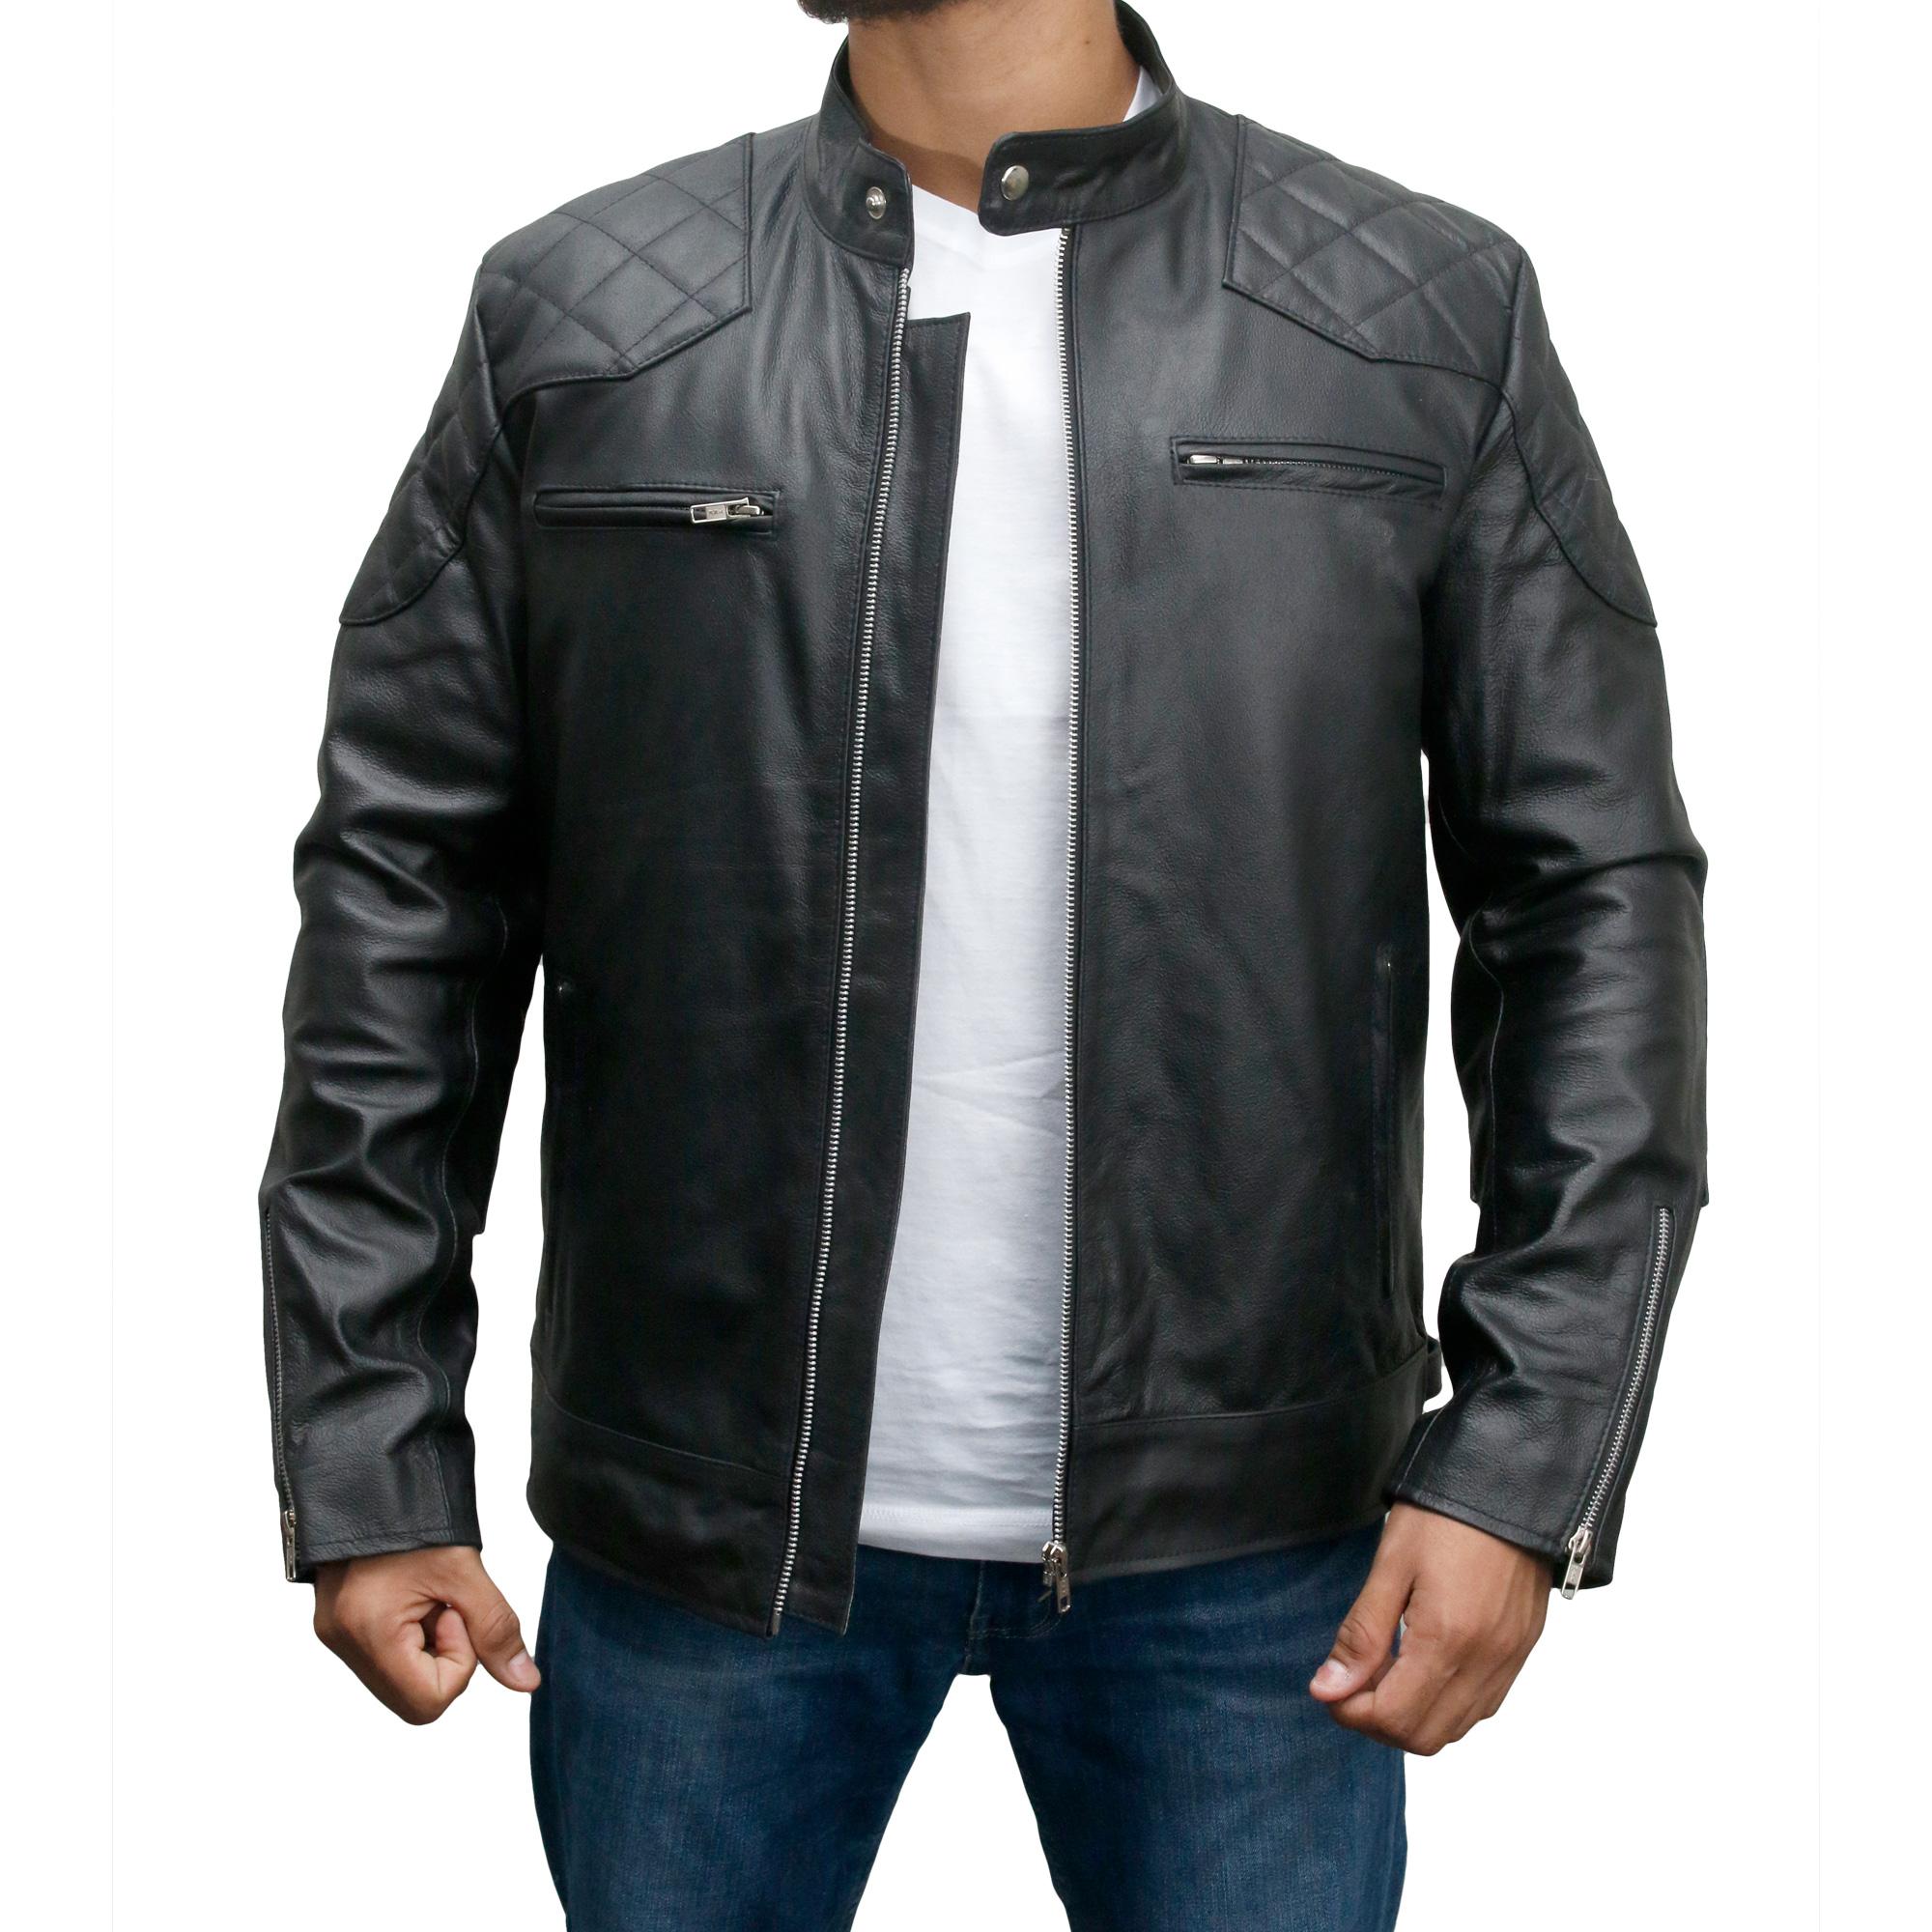 1764d8eda David Beckham Biker Style Leather Jacket